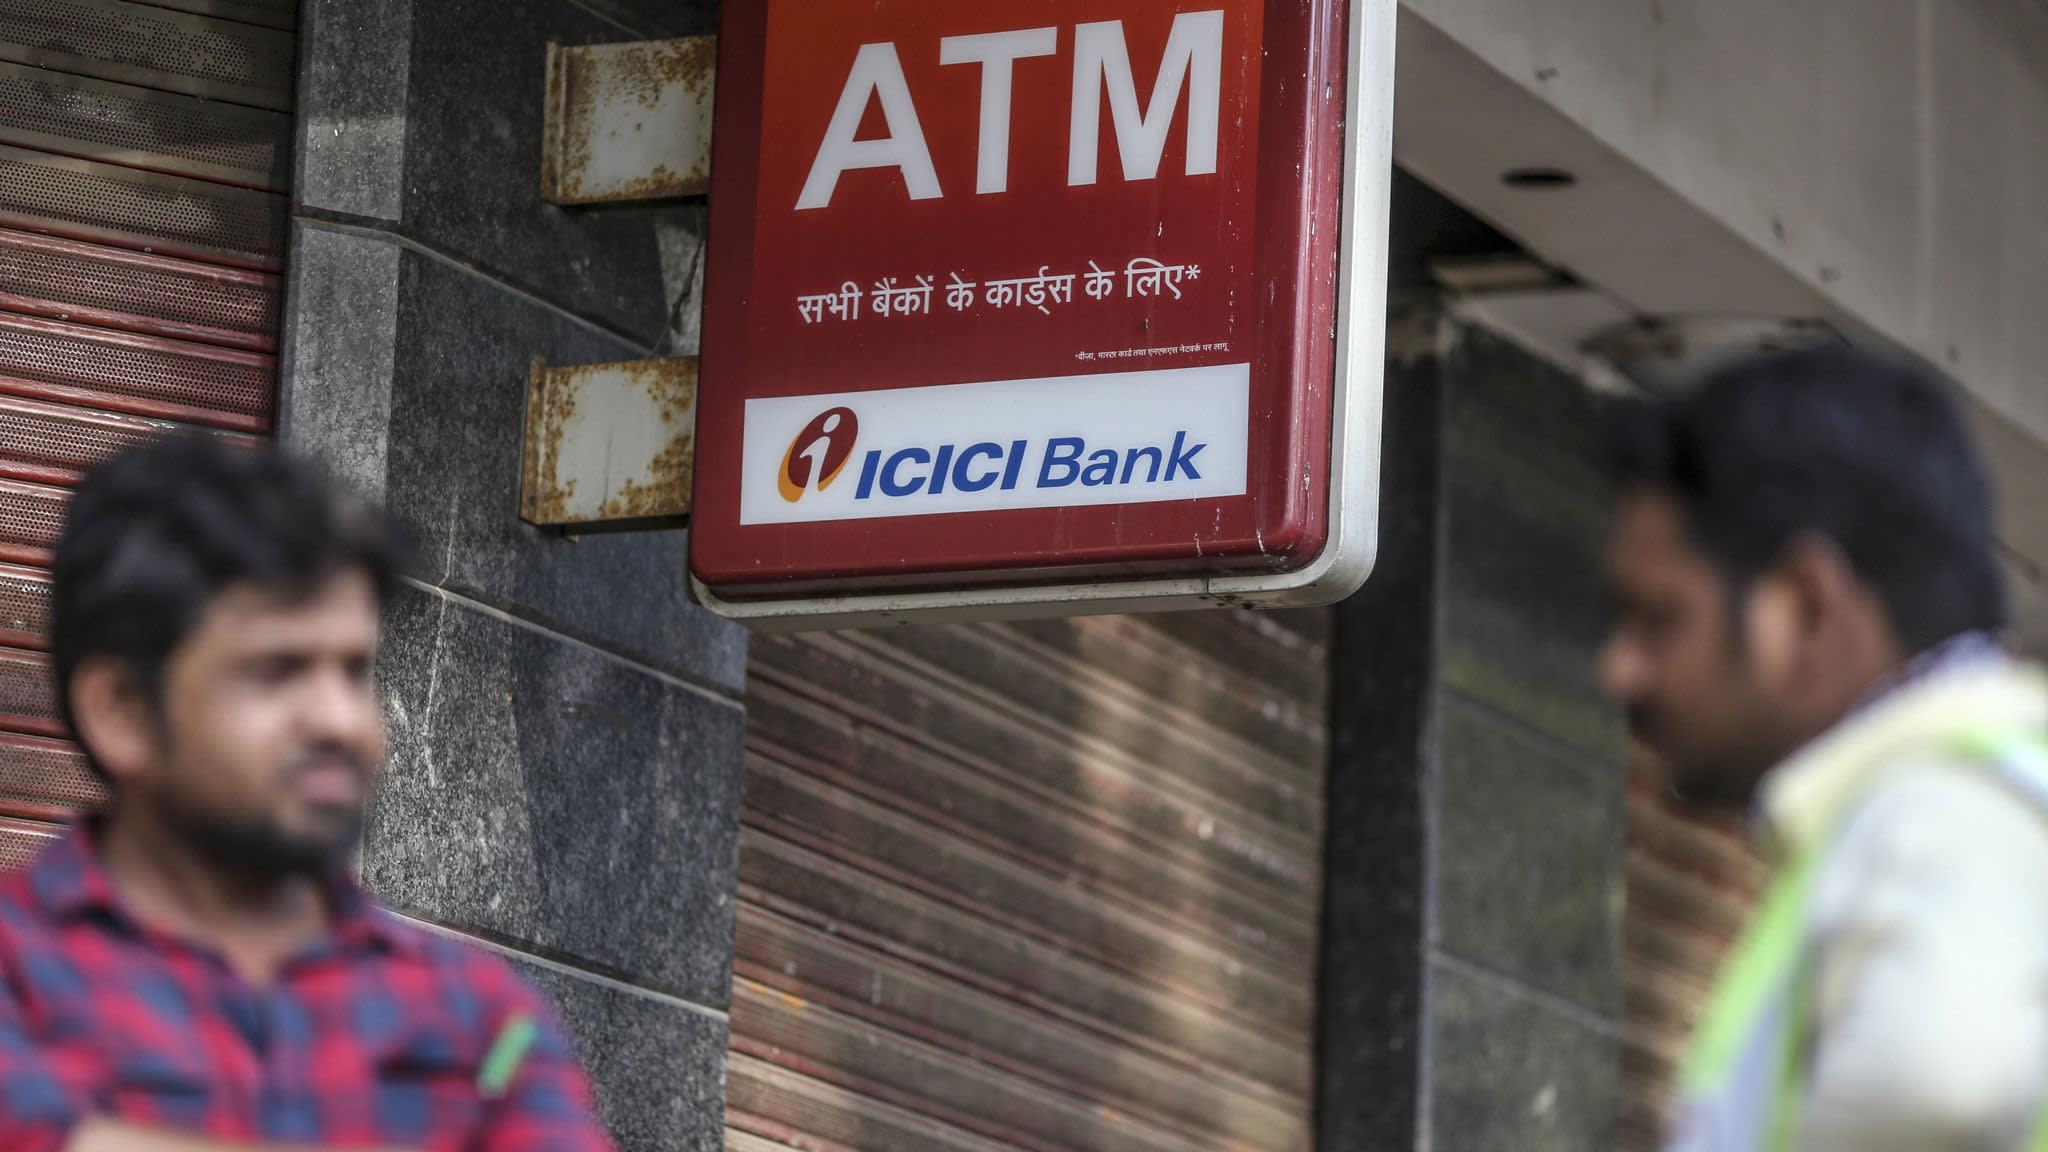 Indian ATM companies warn of cash machine shutdowns